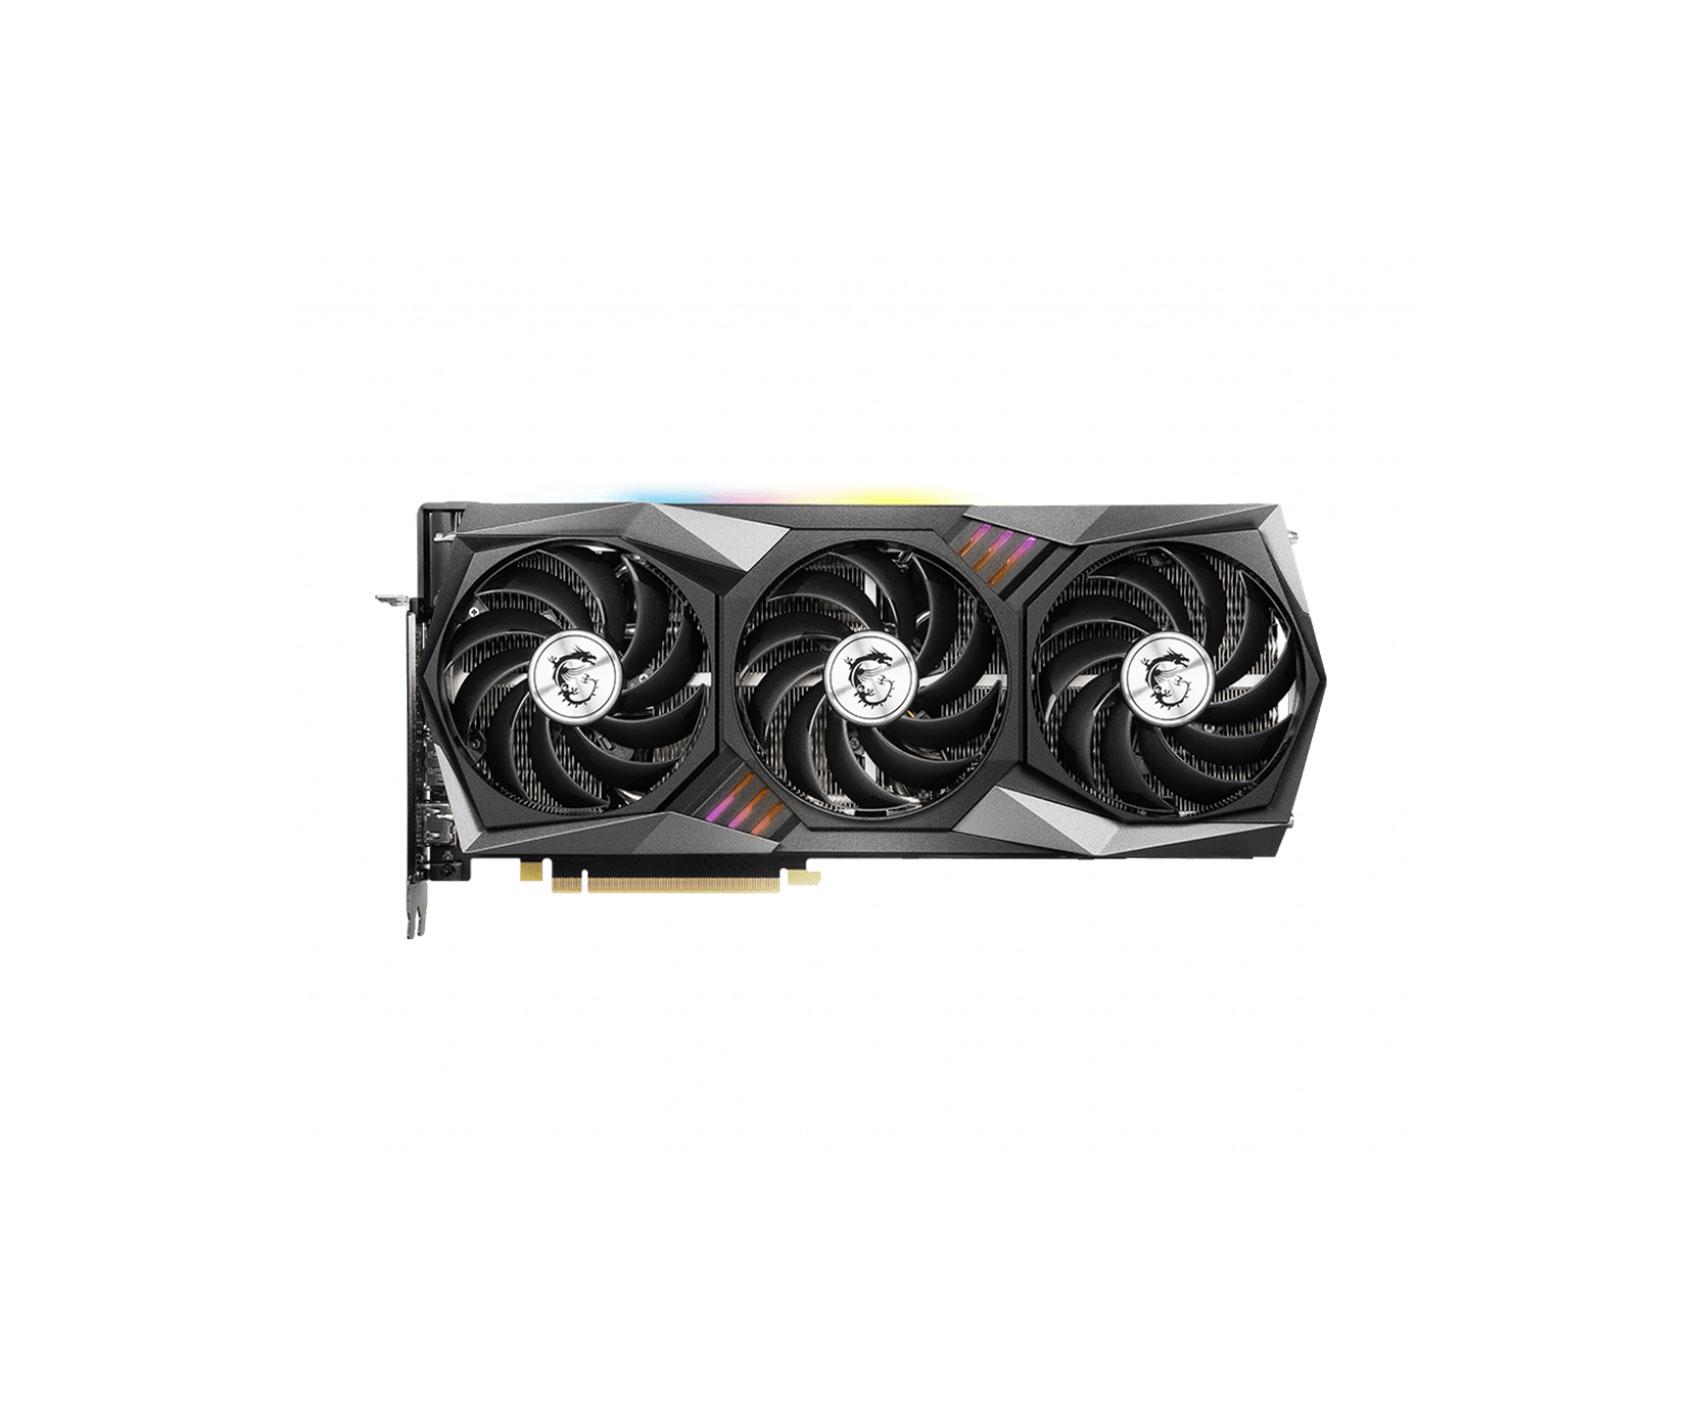 MSI GeForce RTX 3070 GAMING Z TRIO 8GB GDDR6 Graphic Card